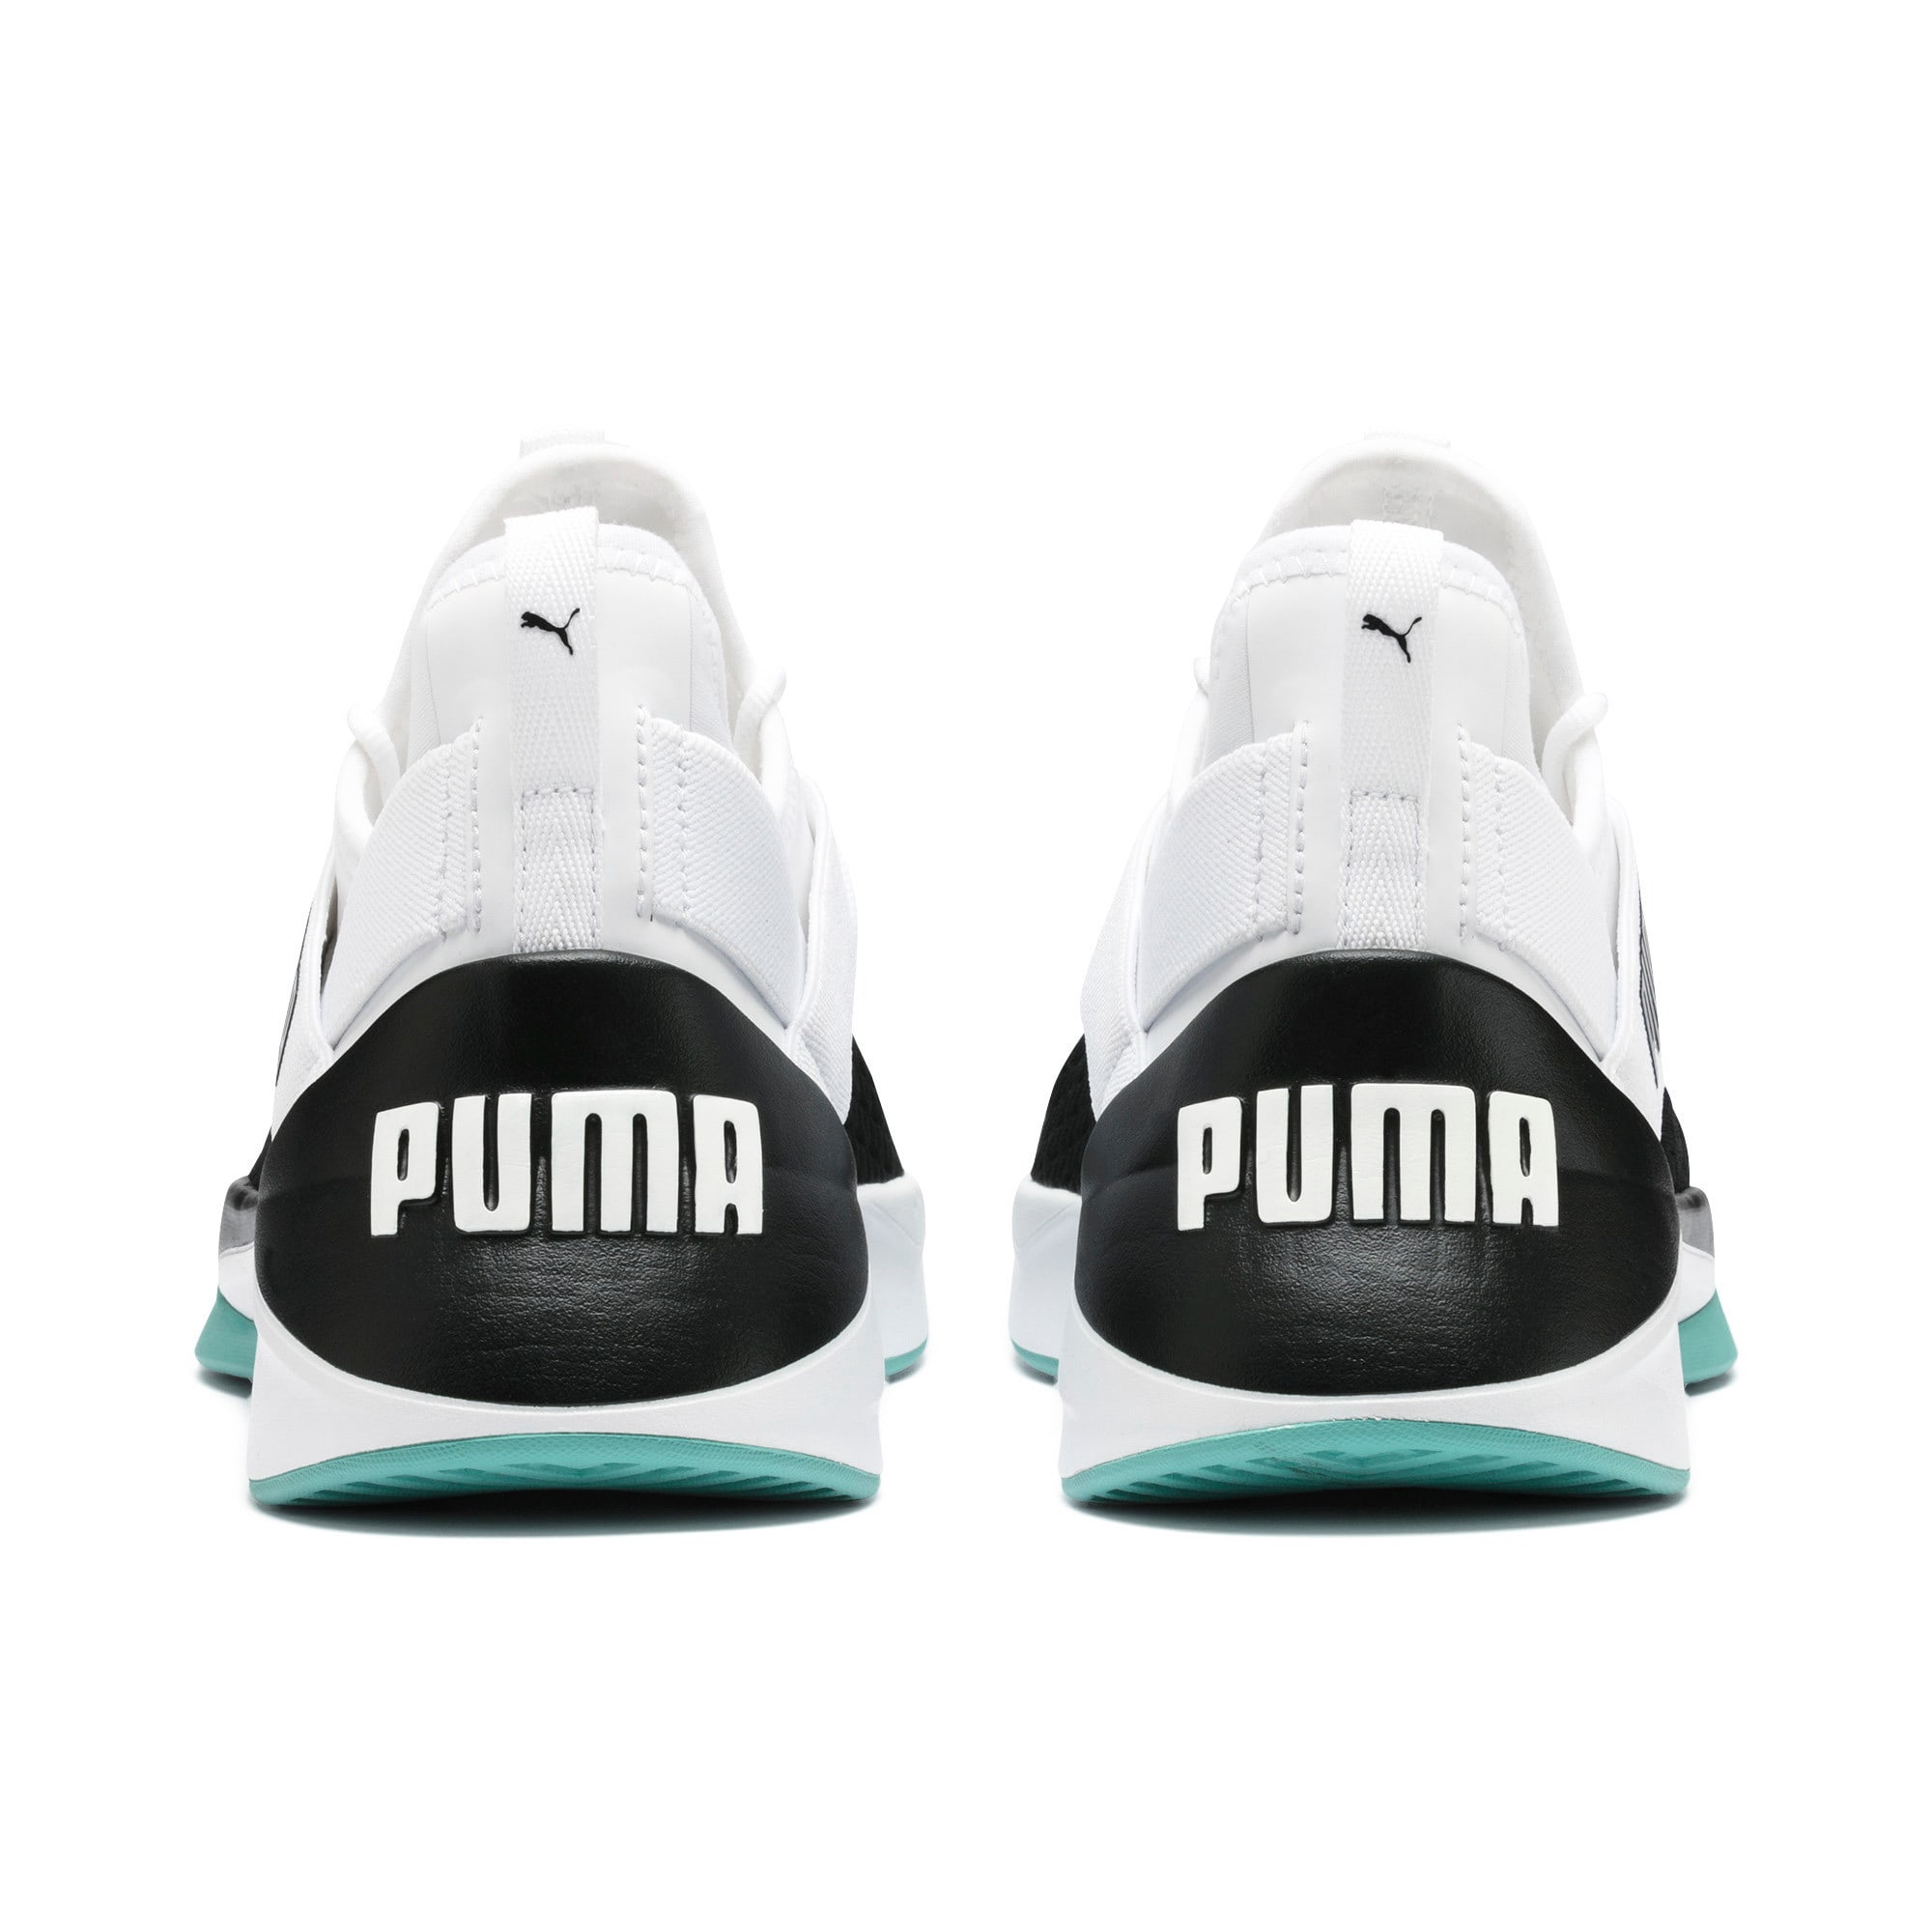 Thumbnail 4 of Jaab XT Men's Trainers, Puma White-Puma Black -1, medium